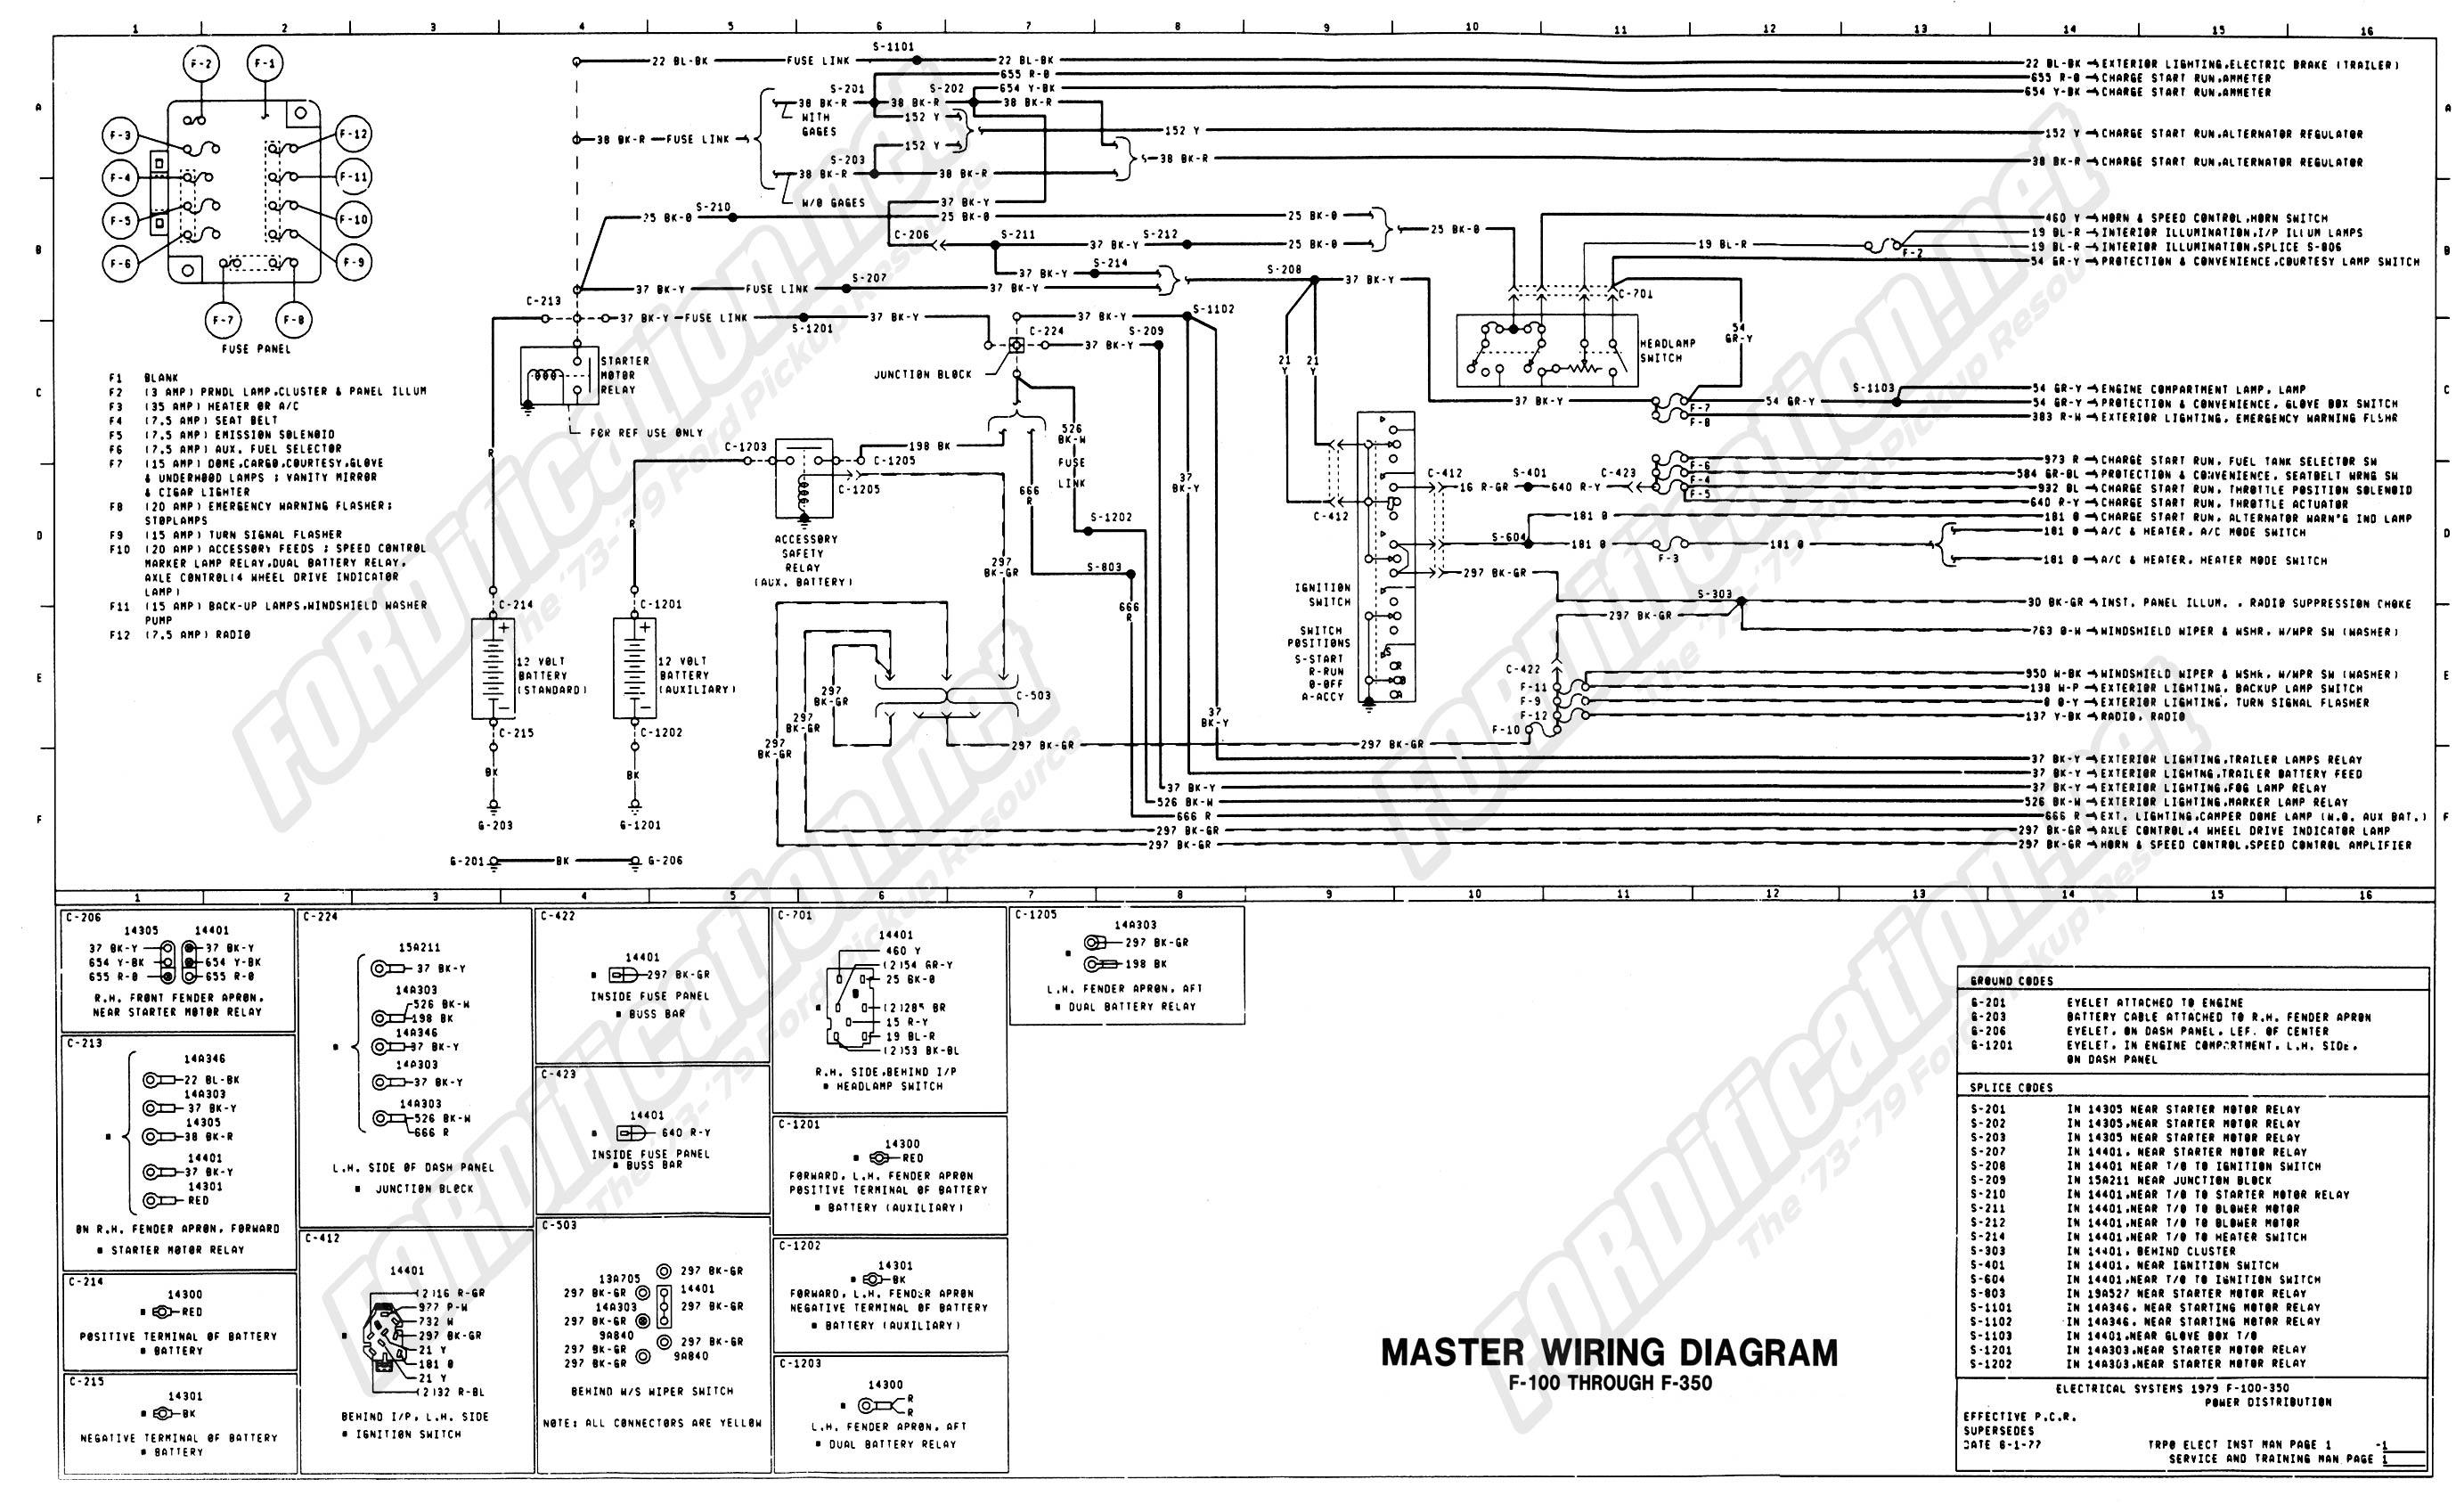 Ne 8081 2000 F250 Wiring Diagram On 2000 Ford F250 Headlight Wiring Diagram Free Diagram